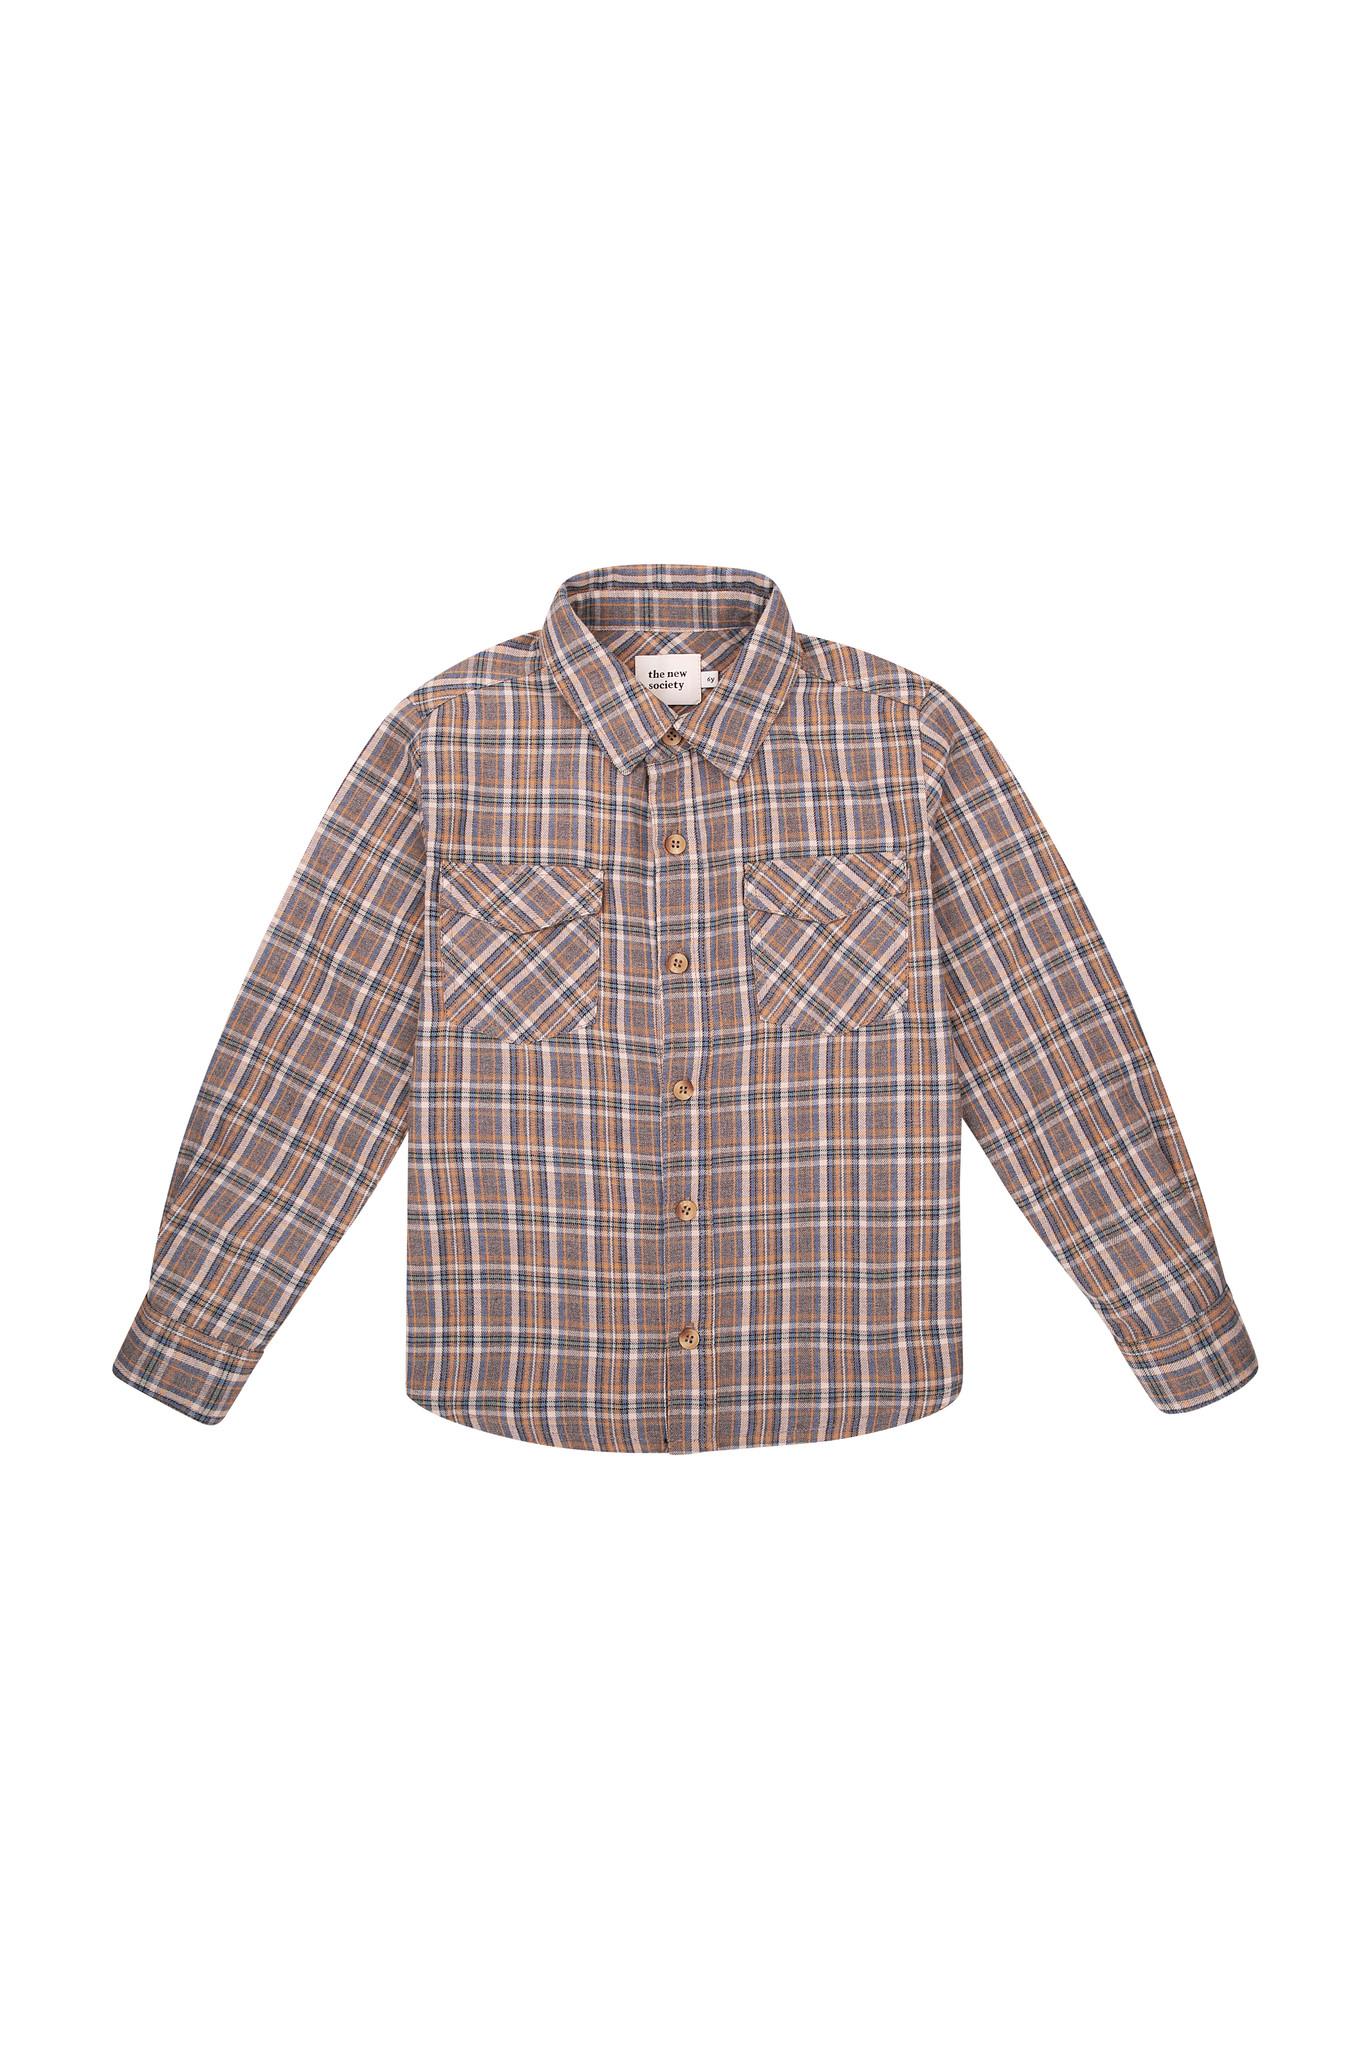 Milosh shirt - Check Soft Blue-1